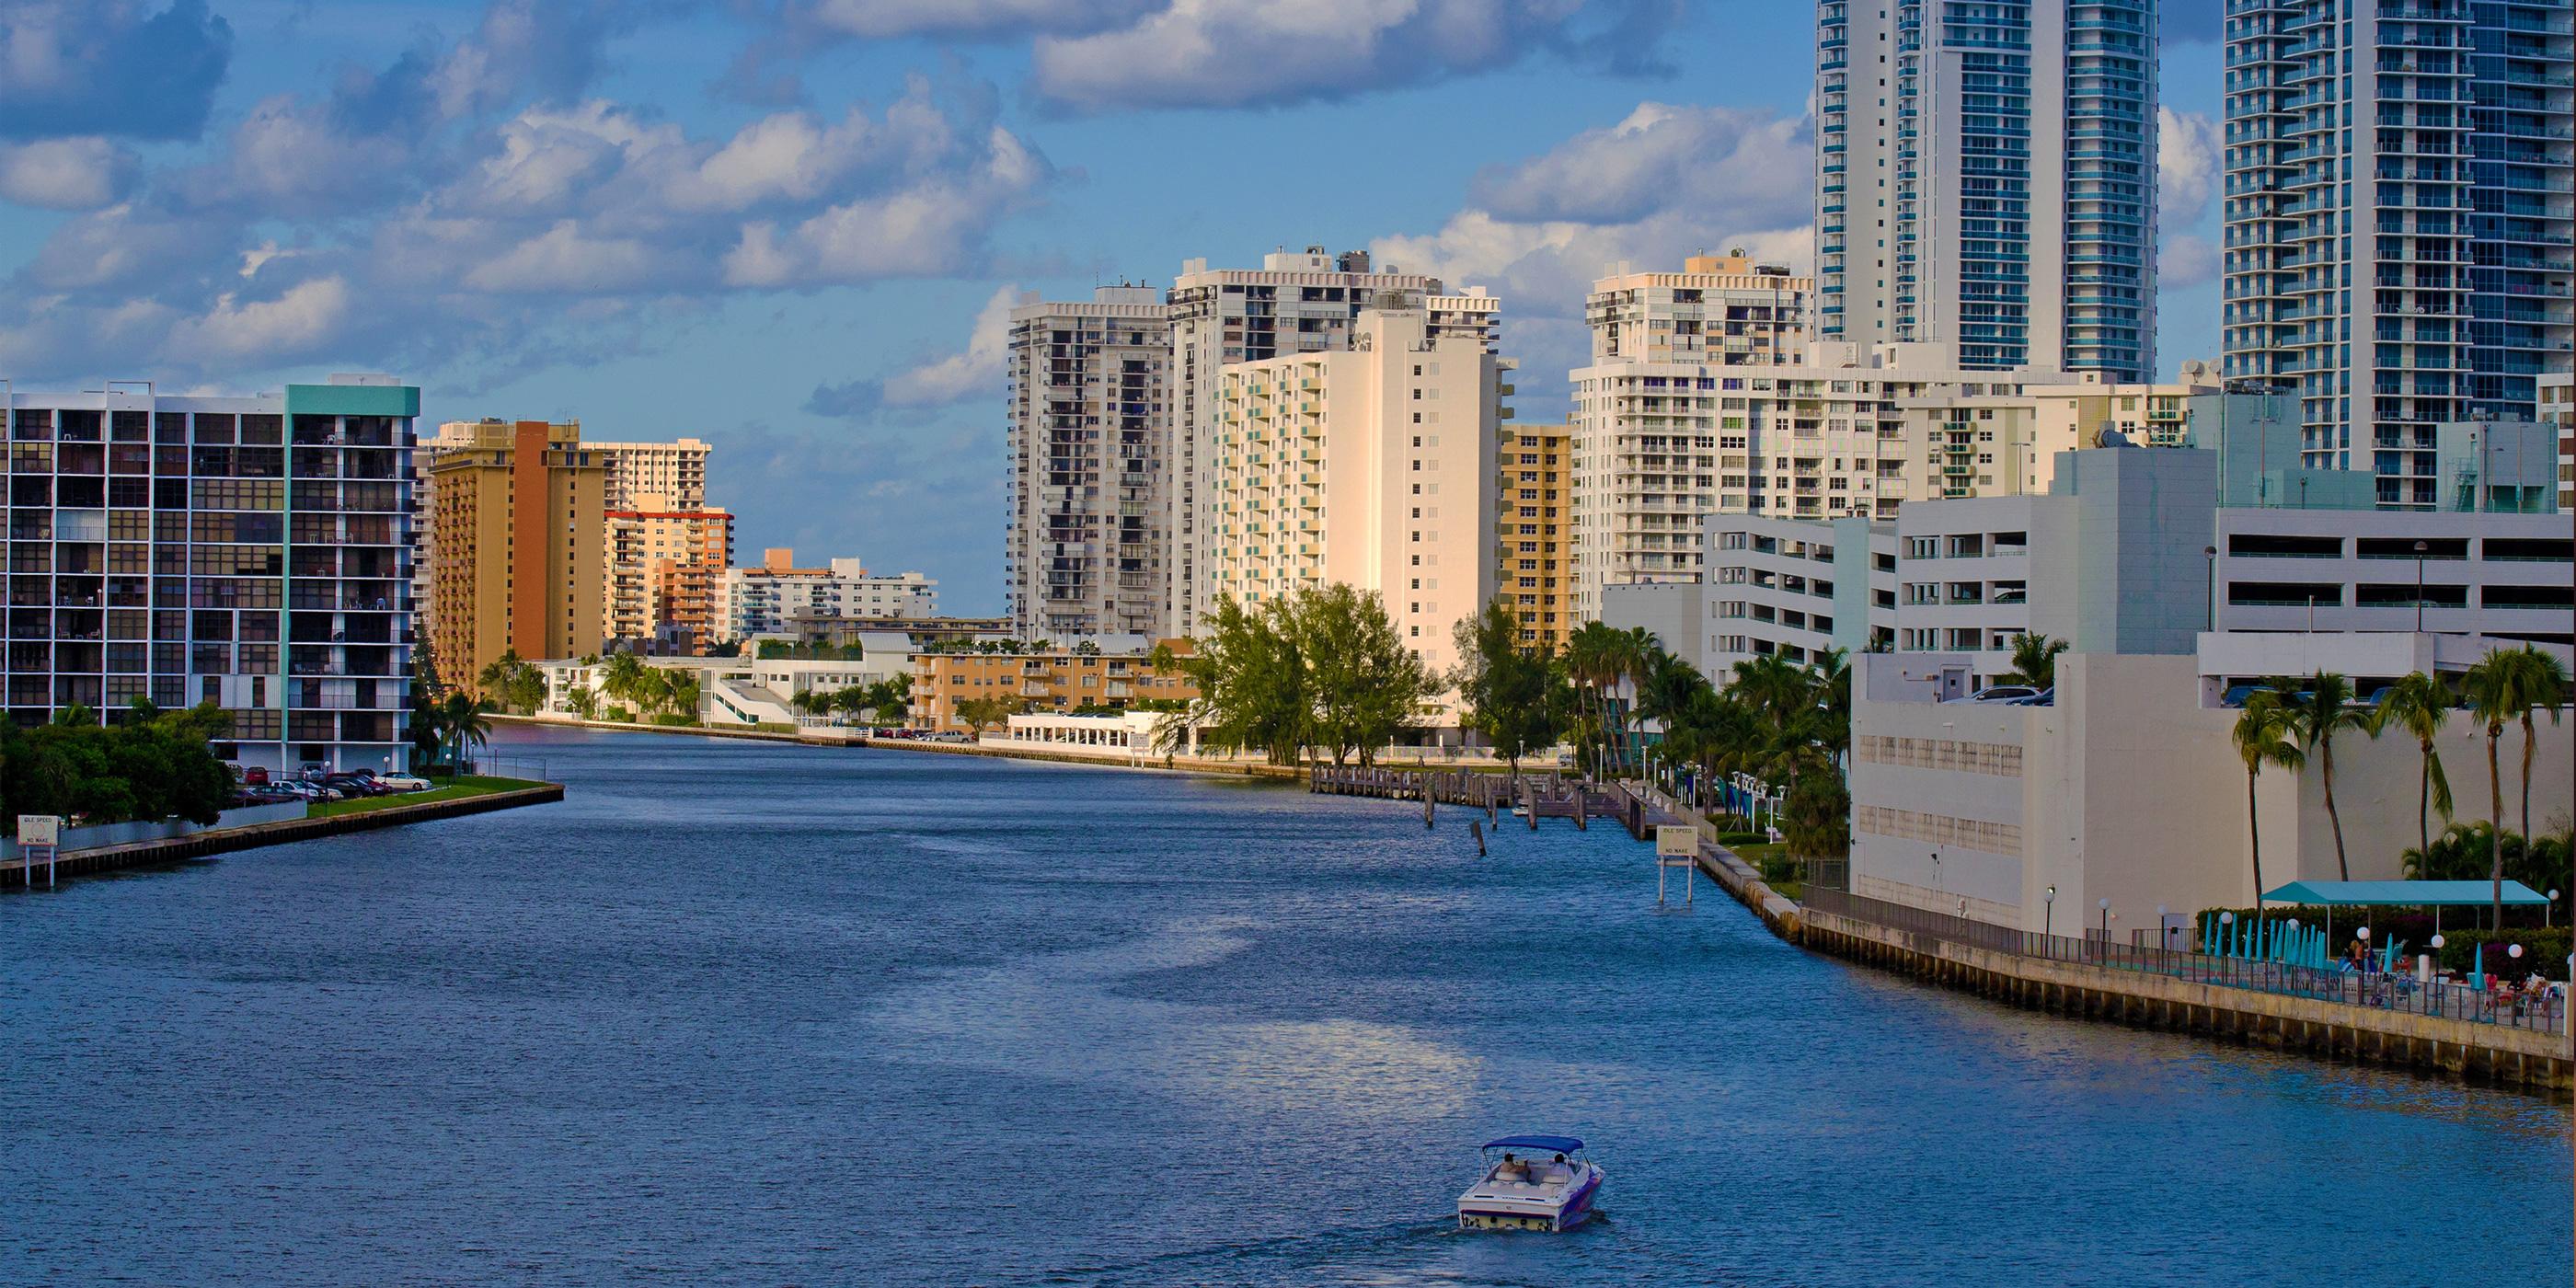 south florida waterway